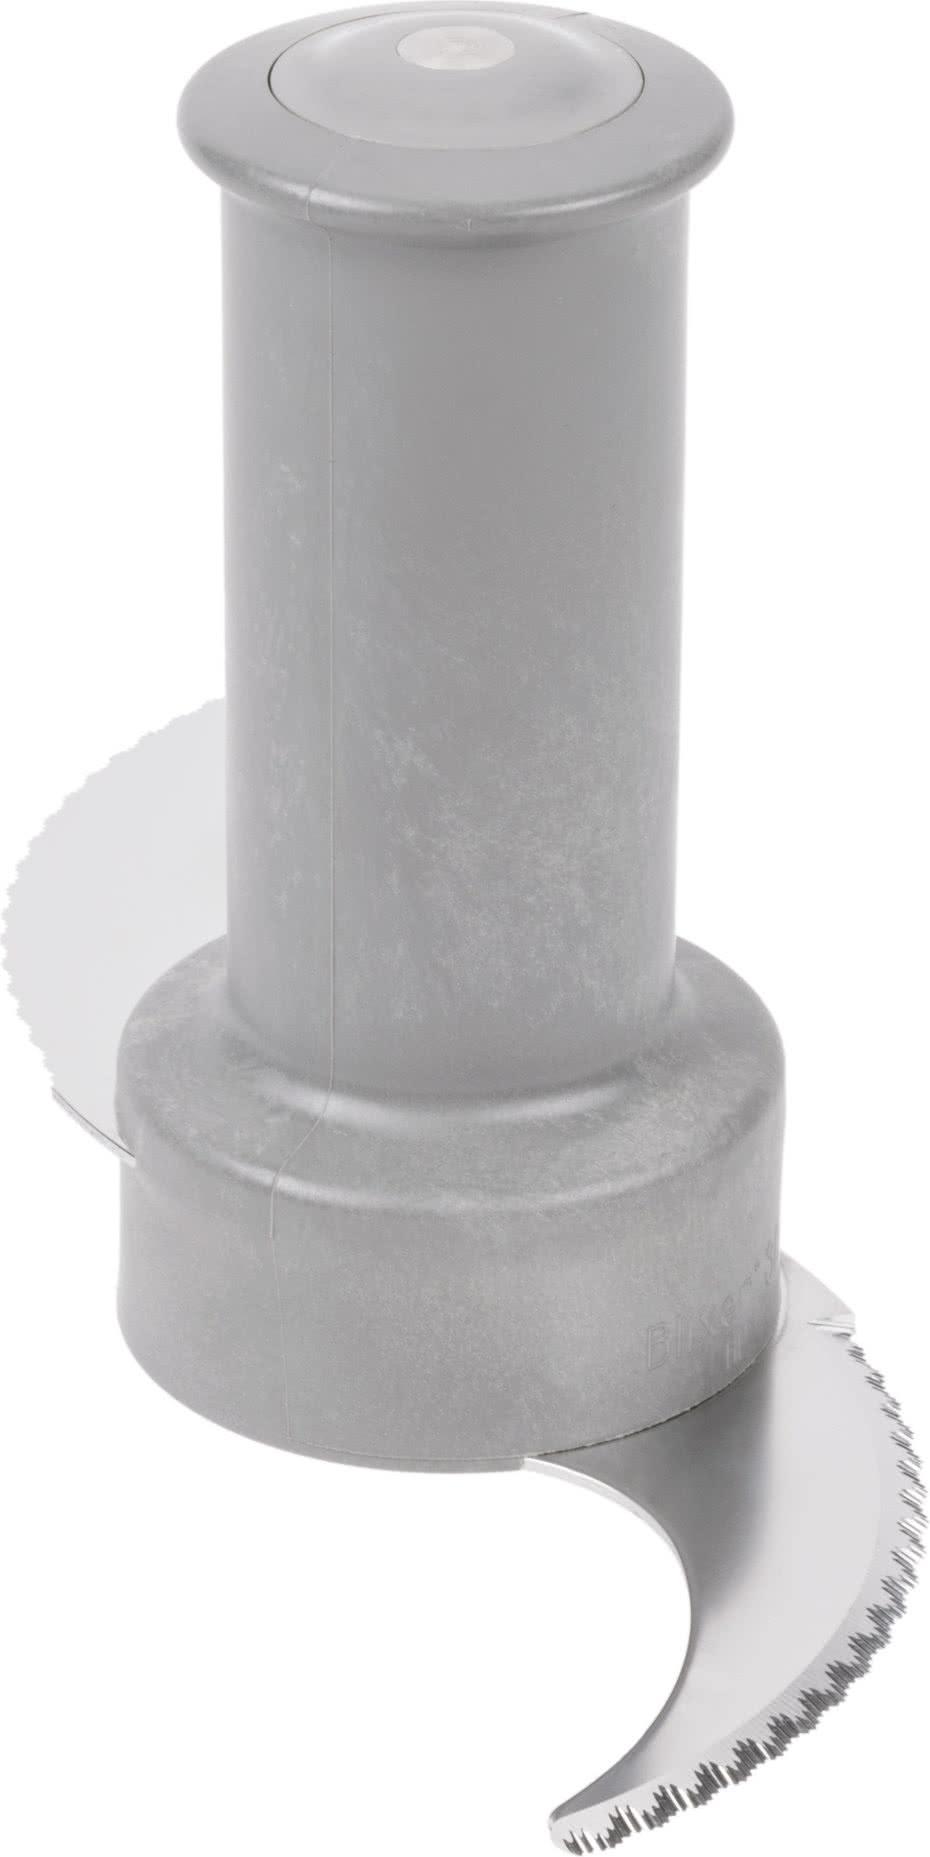 Зазубренный нож Robot Coupe27447 - 1